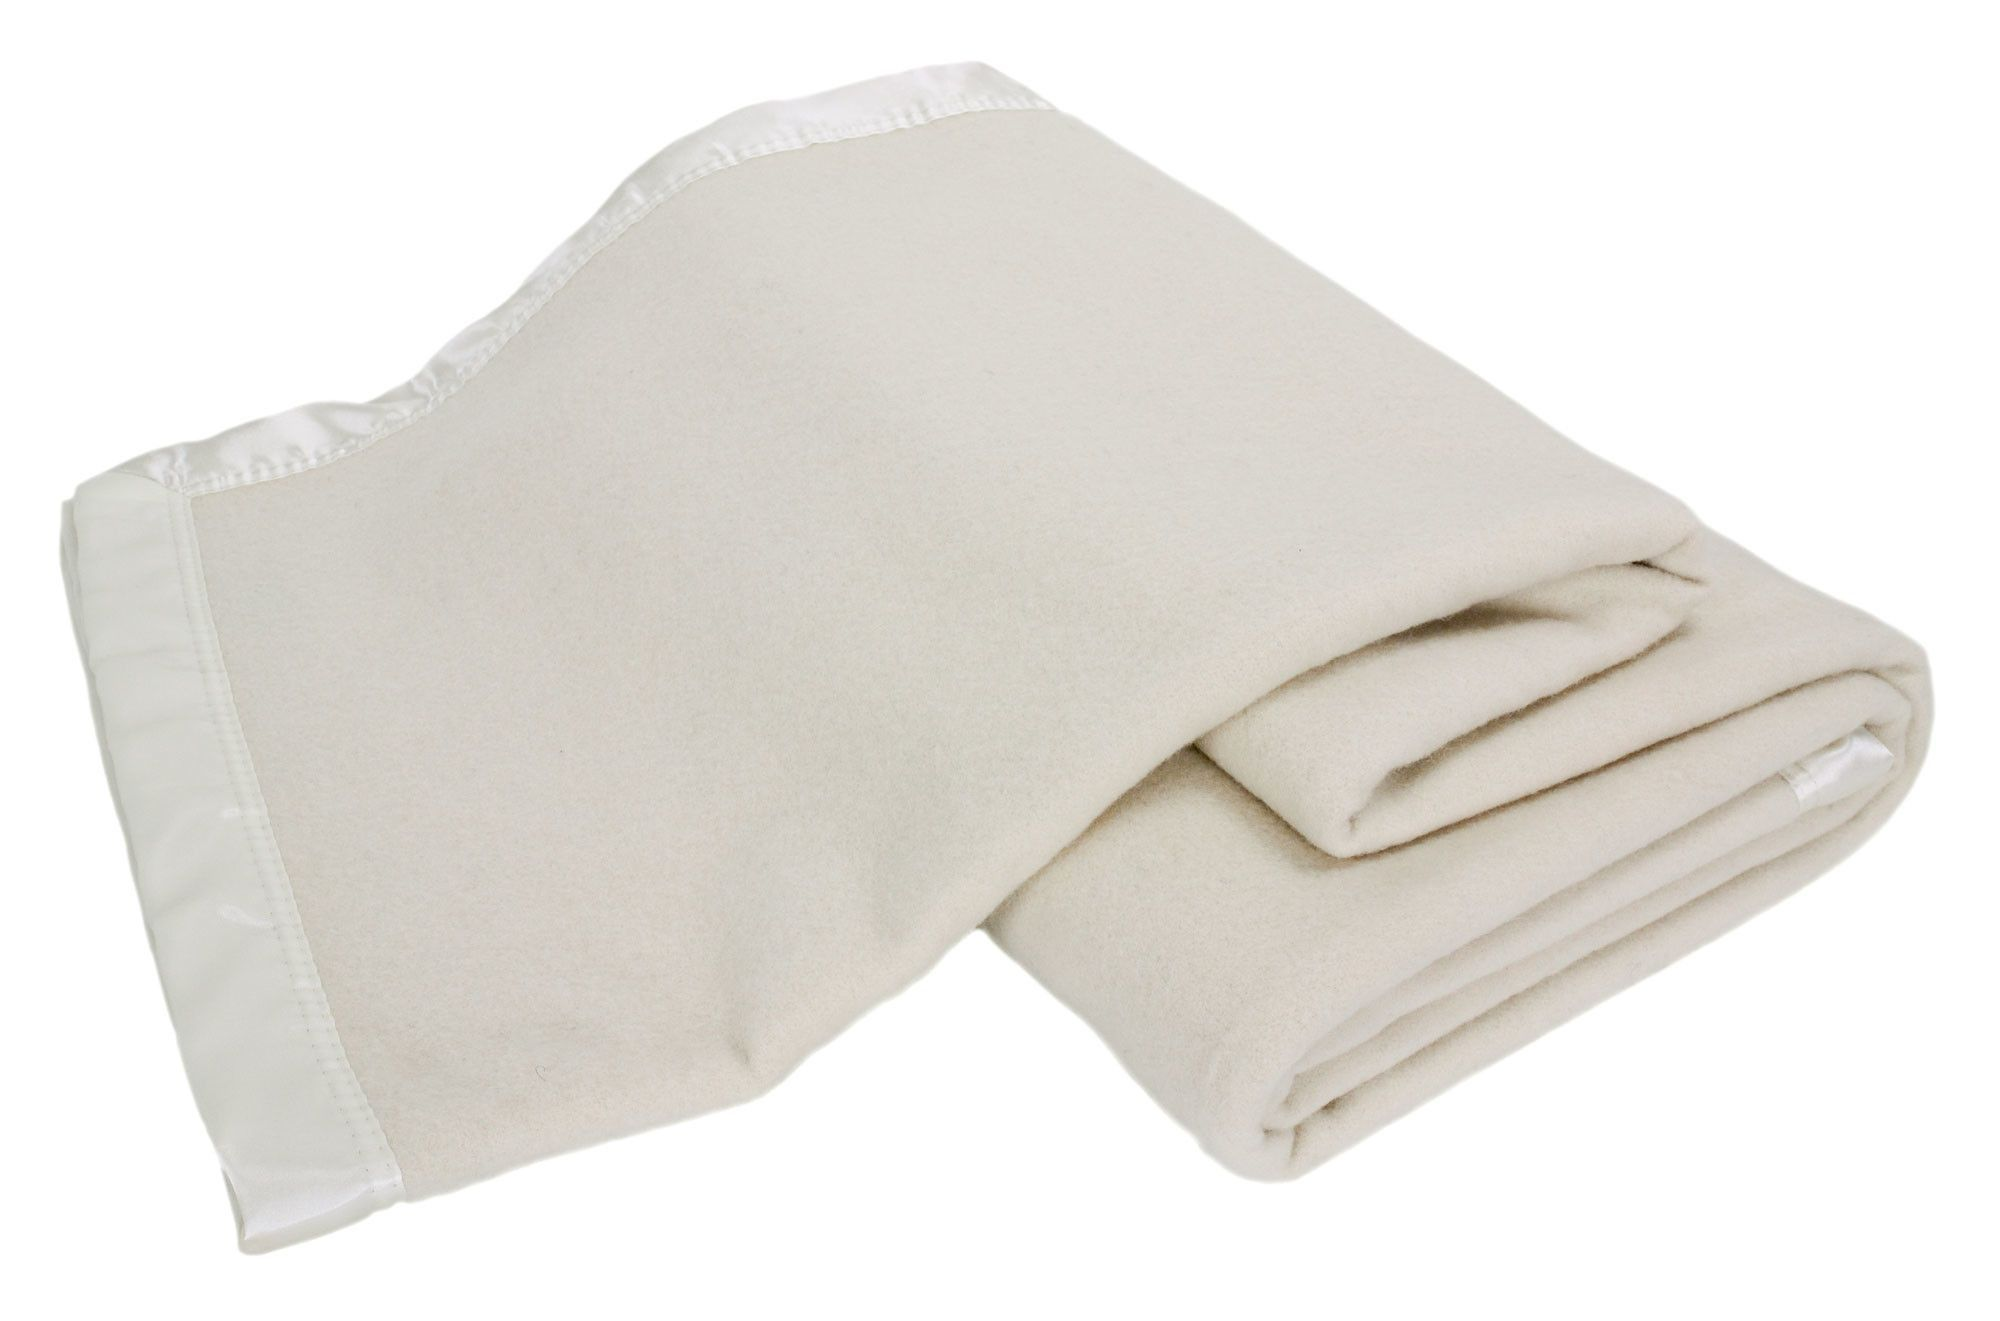 Luxurious Wool Blanket King size blanket, Merino wool